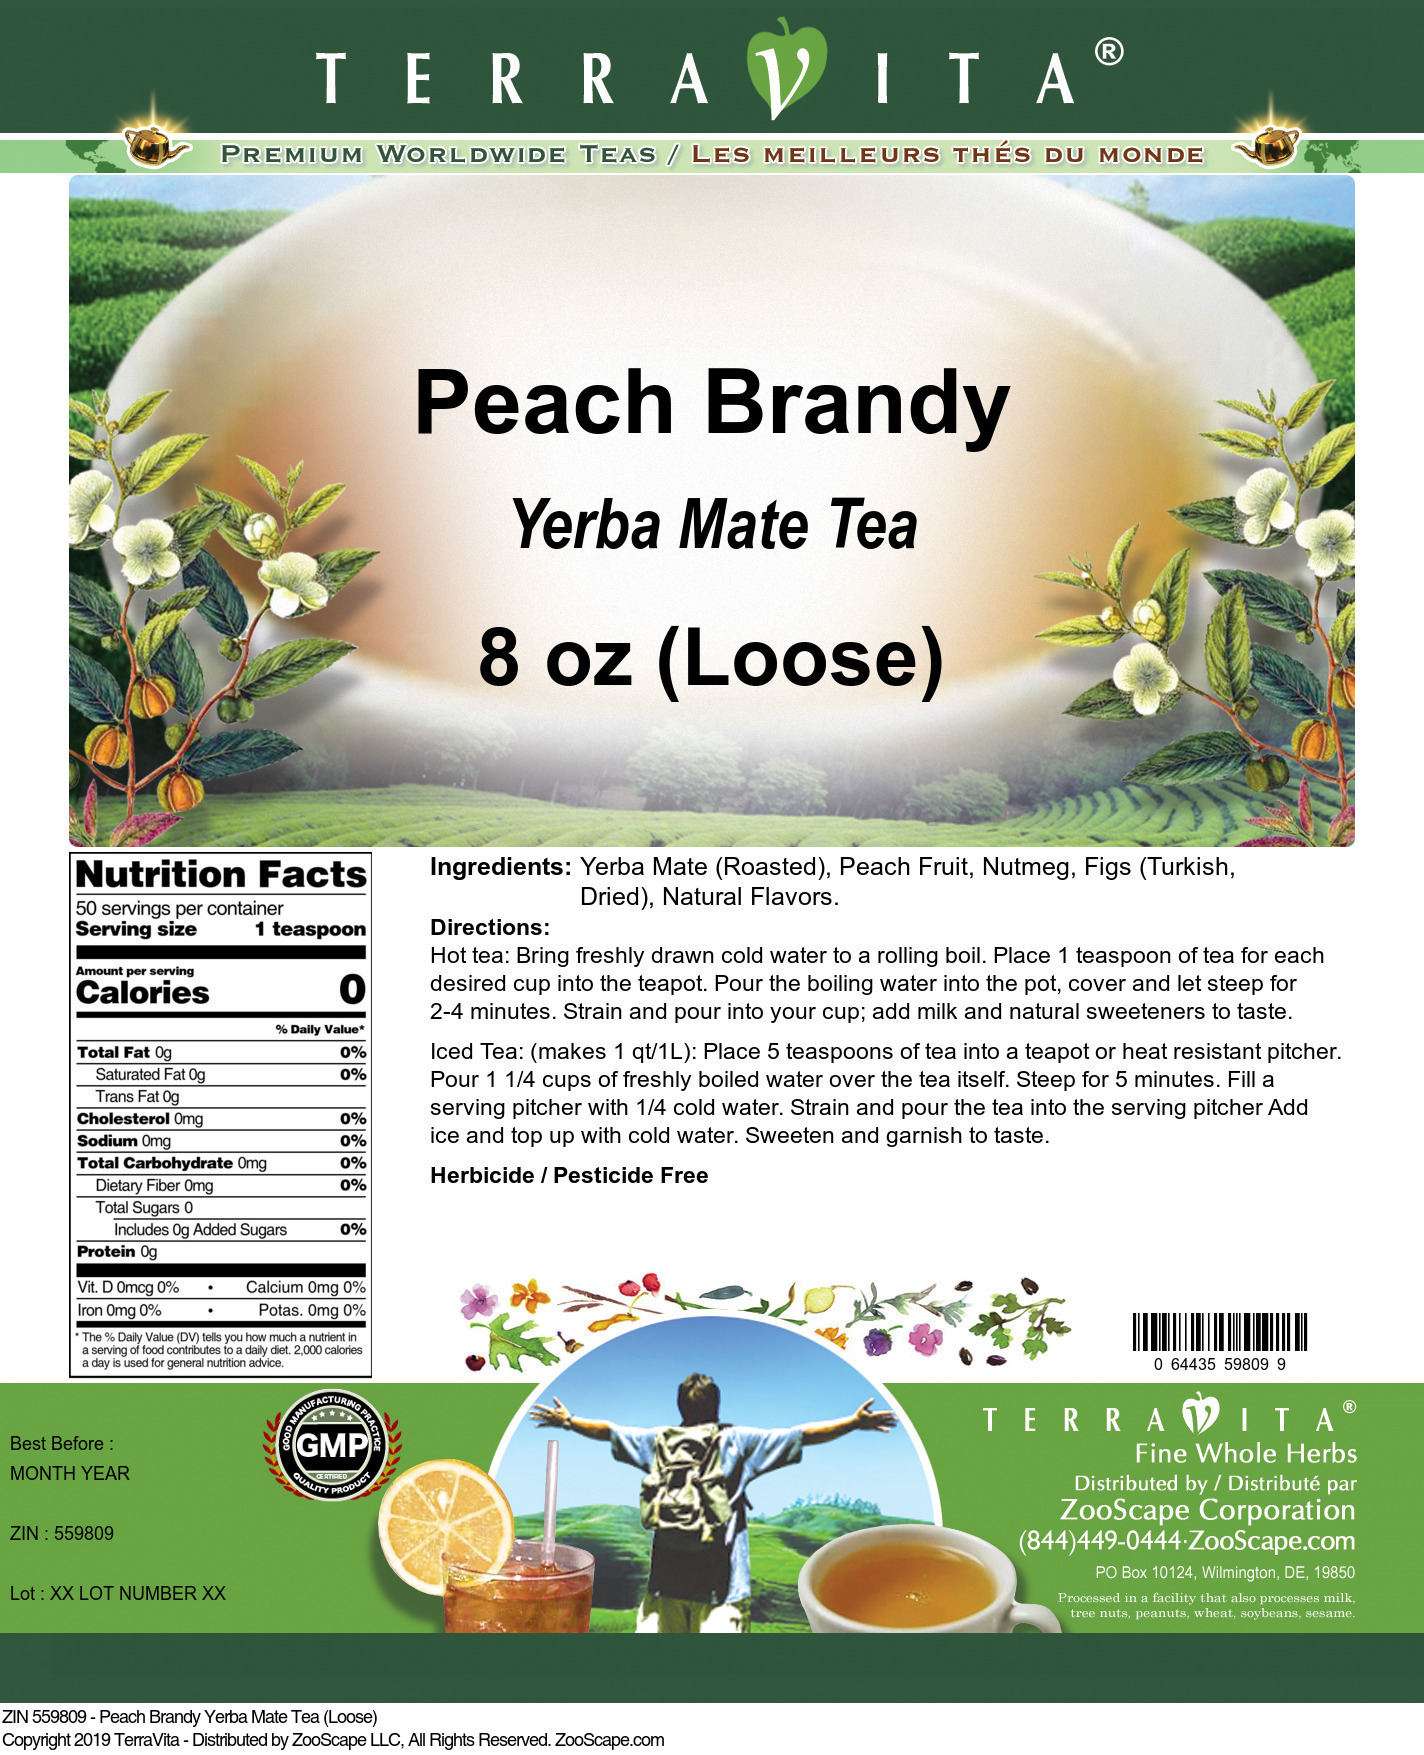 Peach Brandy Yerba Mate Tea (Loose)